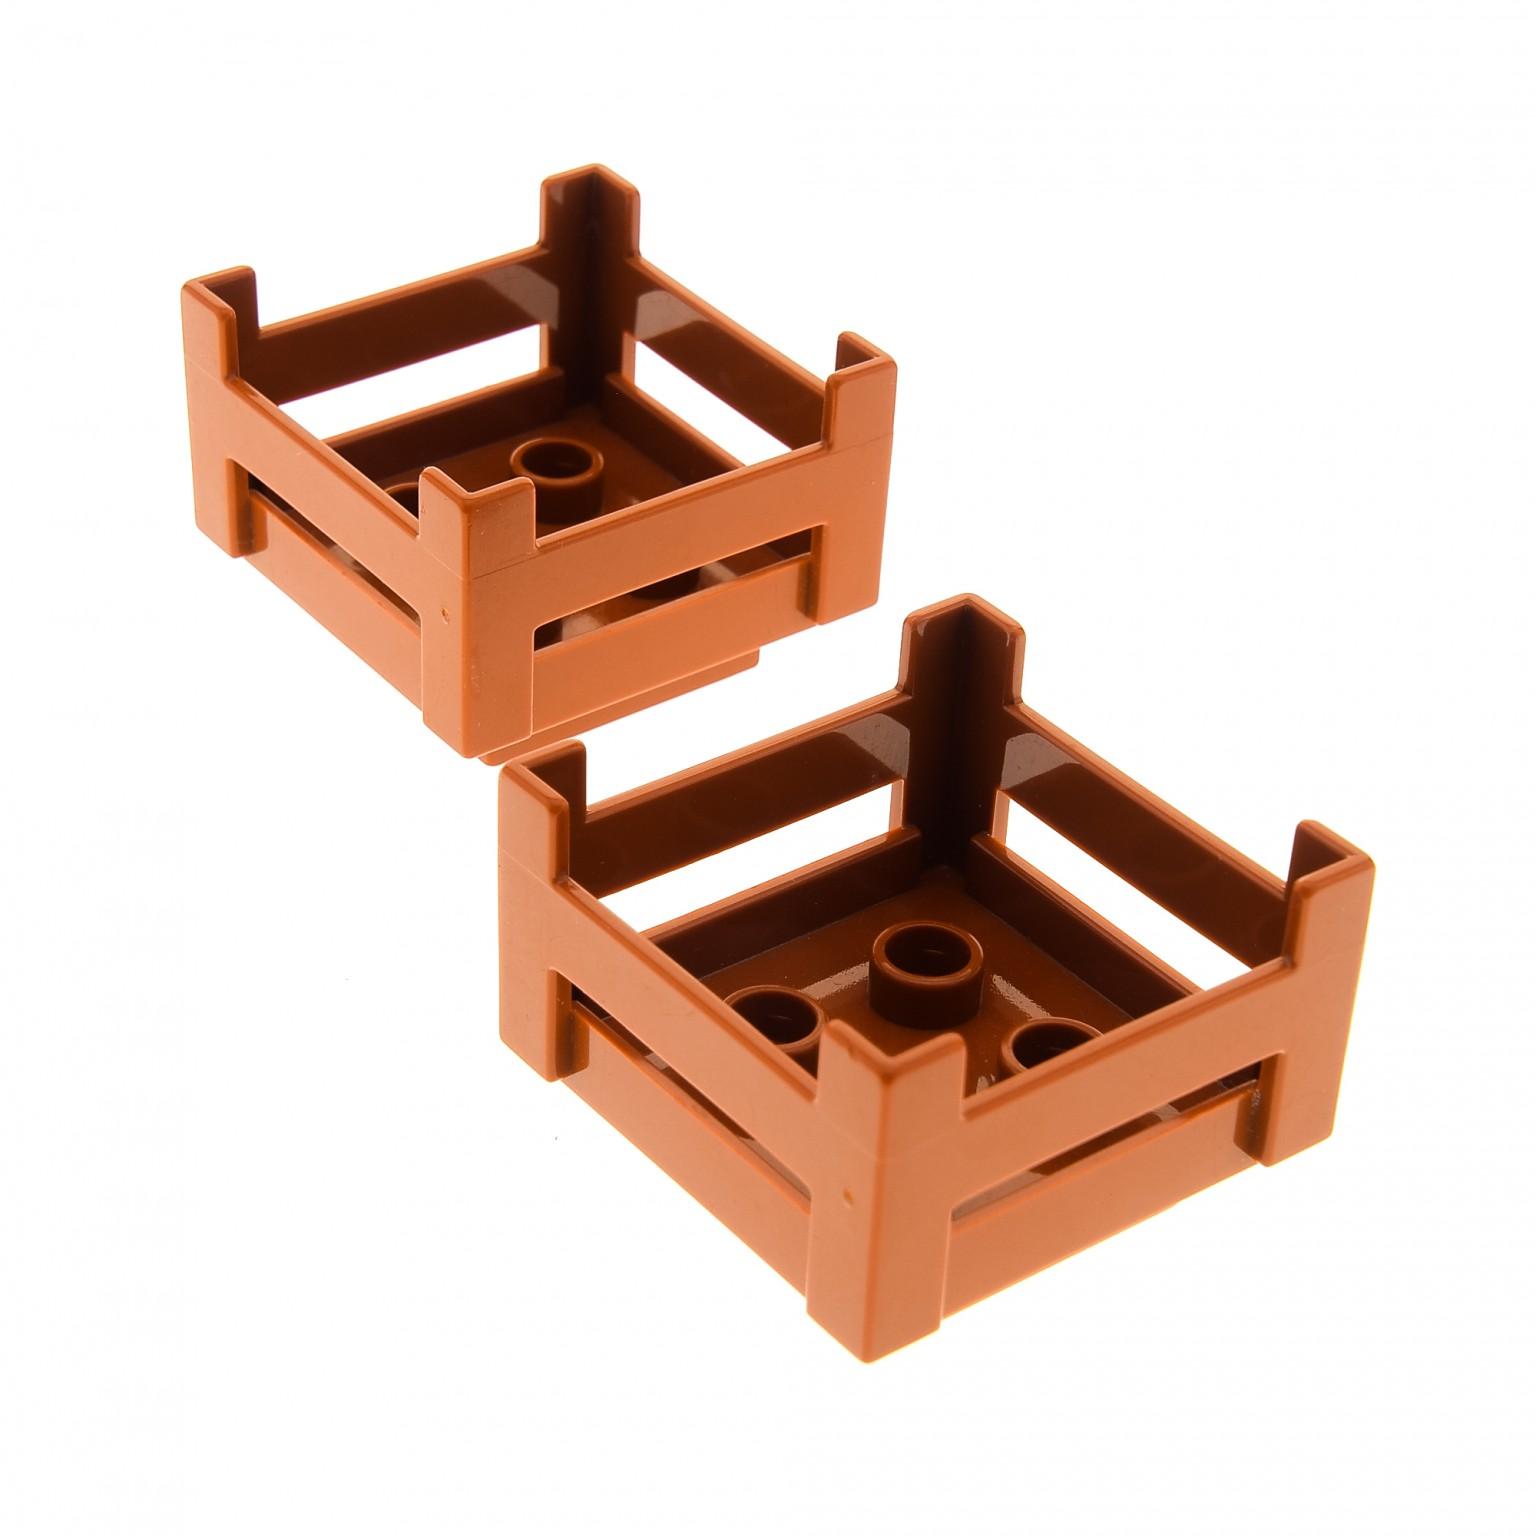 2 x lego duplo möbel kiste dunkel orange braun korb container